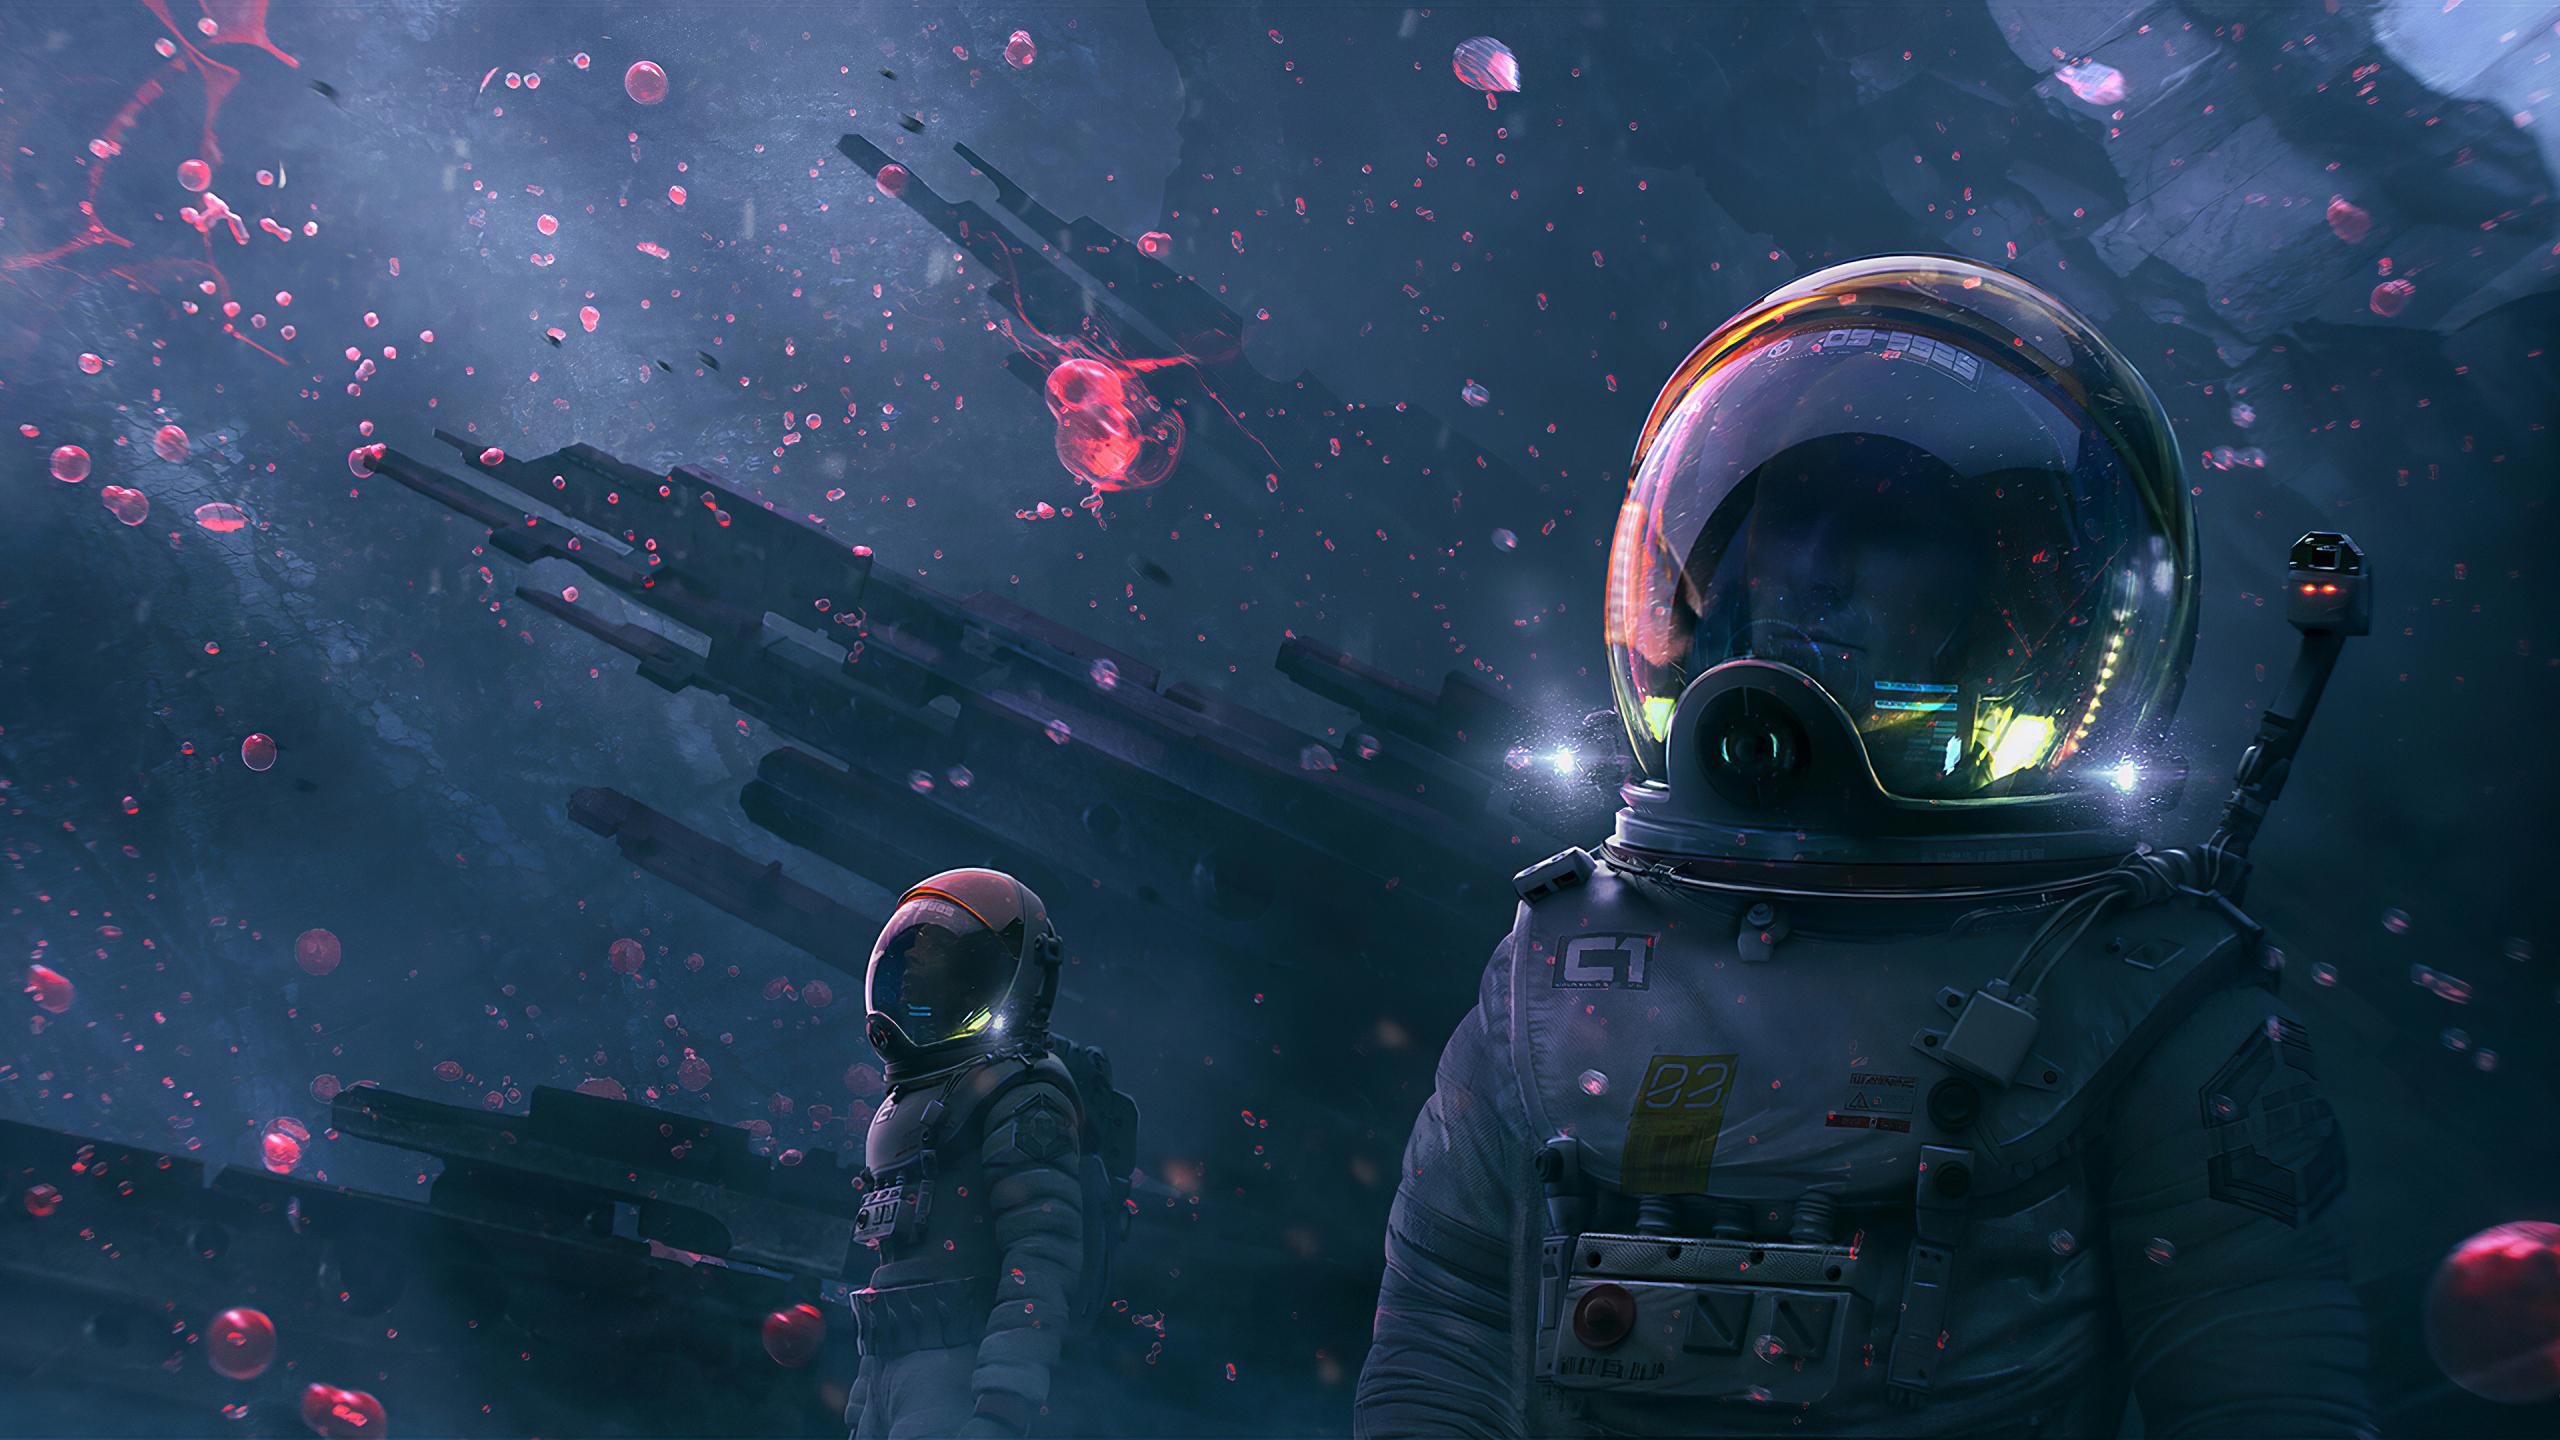 2560x1440 Astronaut Digital Art 1440p Resolution Wallpaper Hd Artist 4k Wallpapers Images Photos And Background